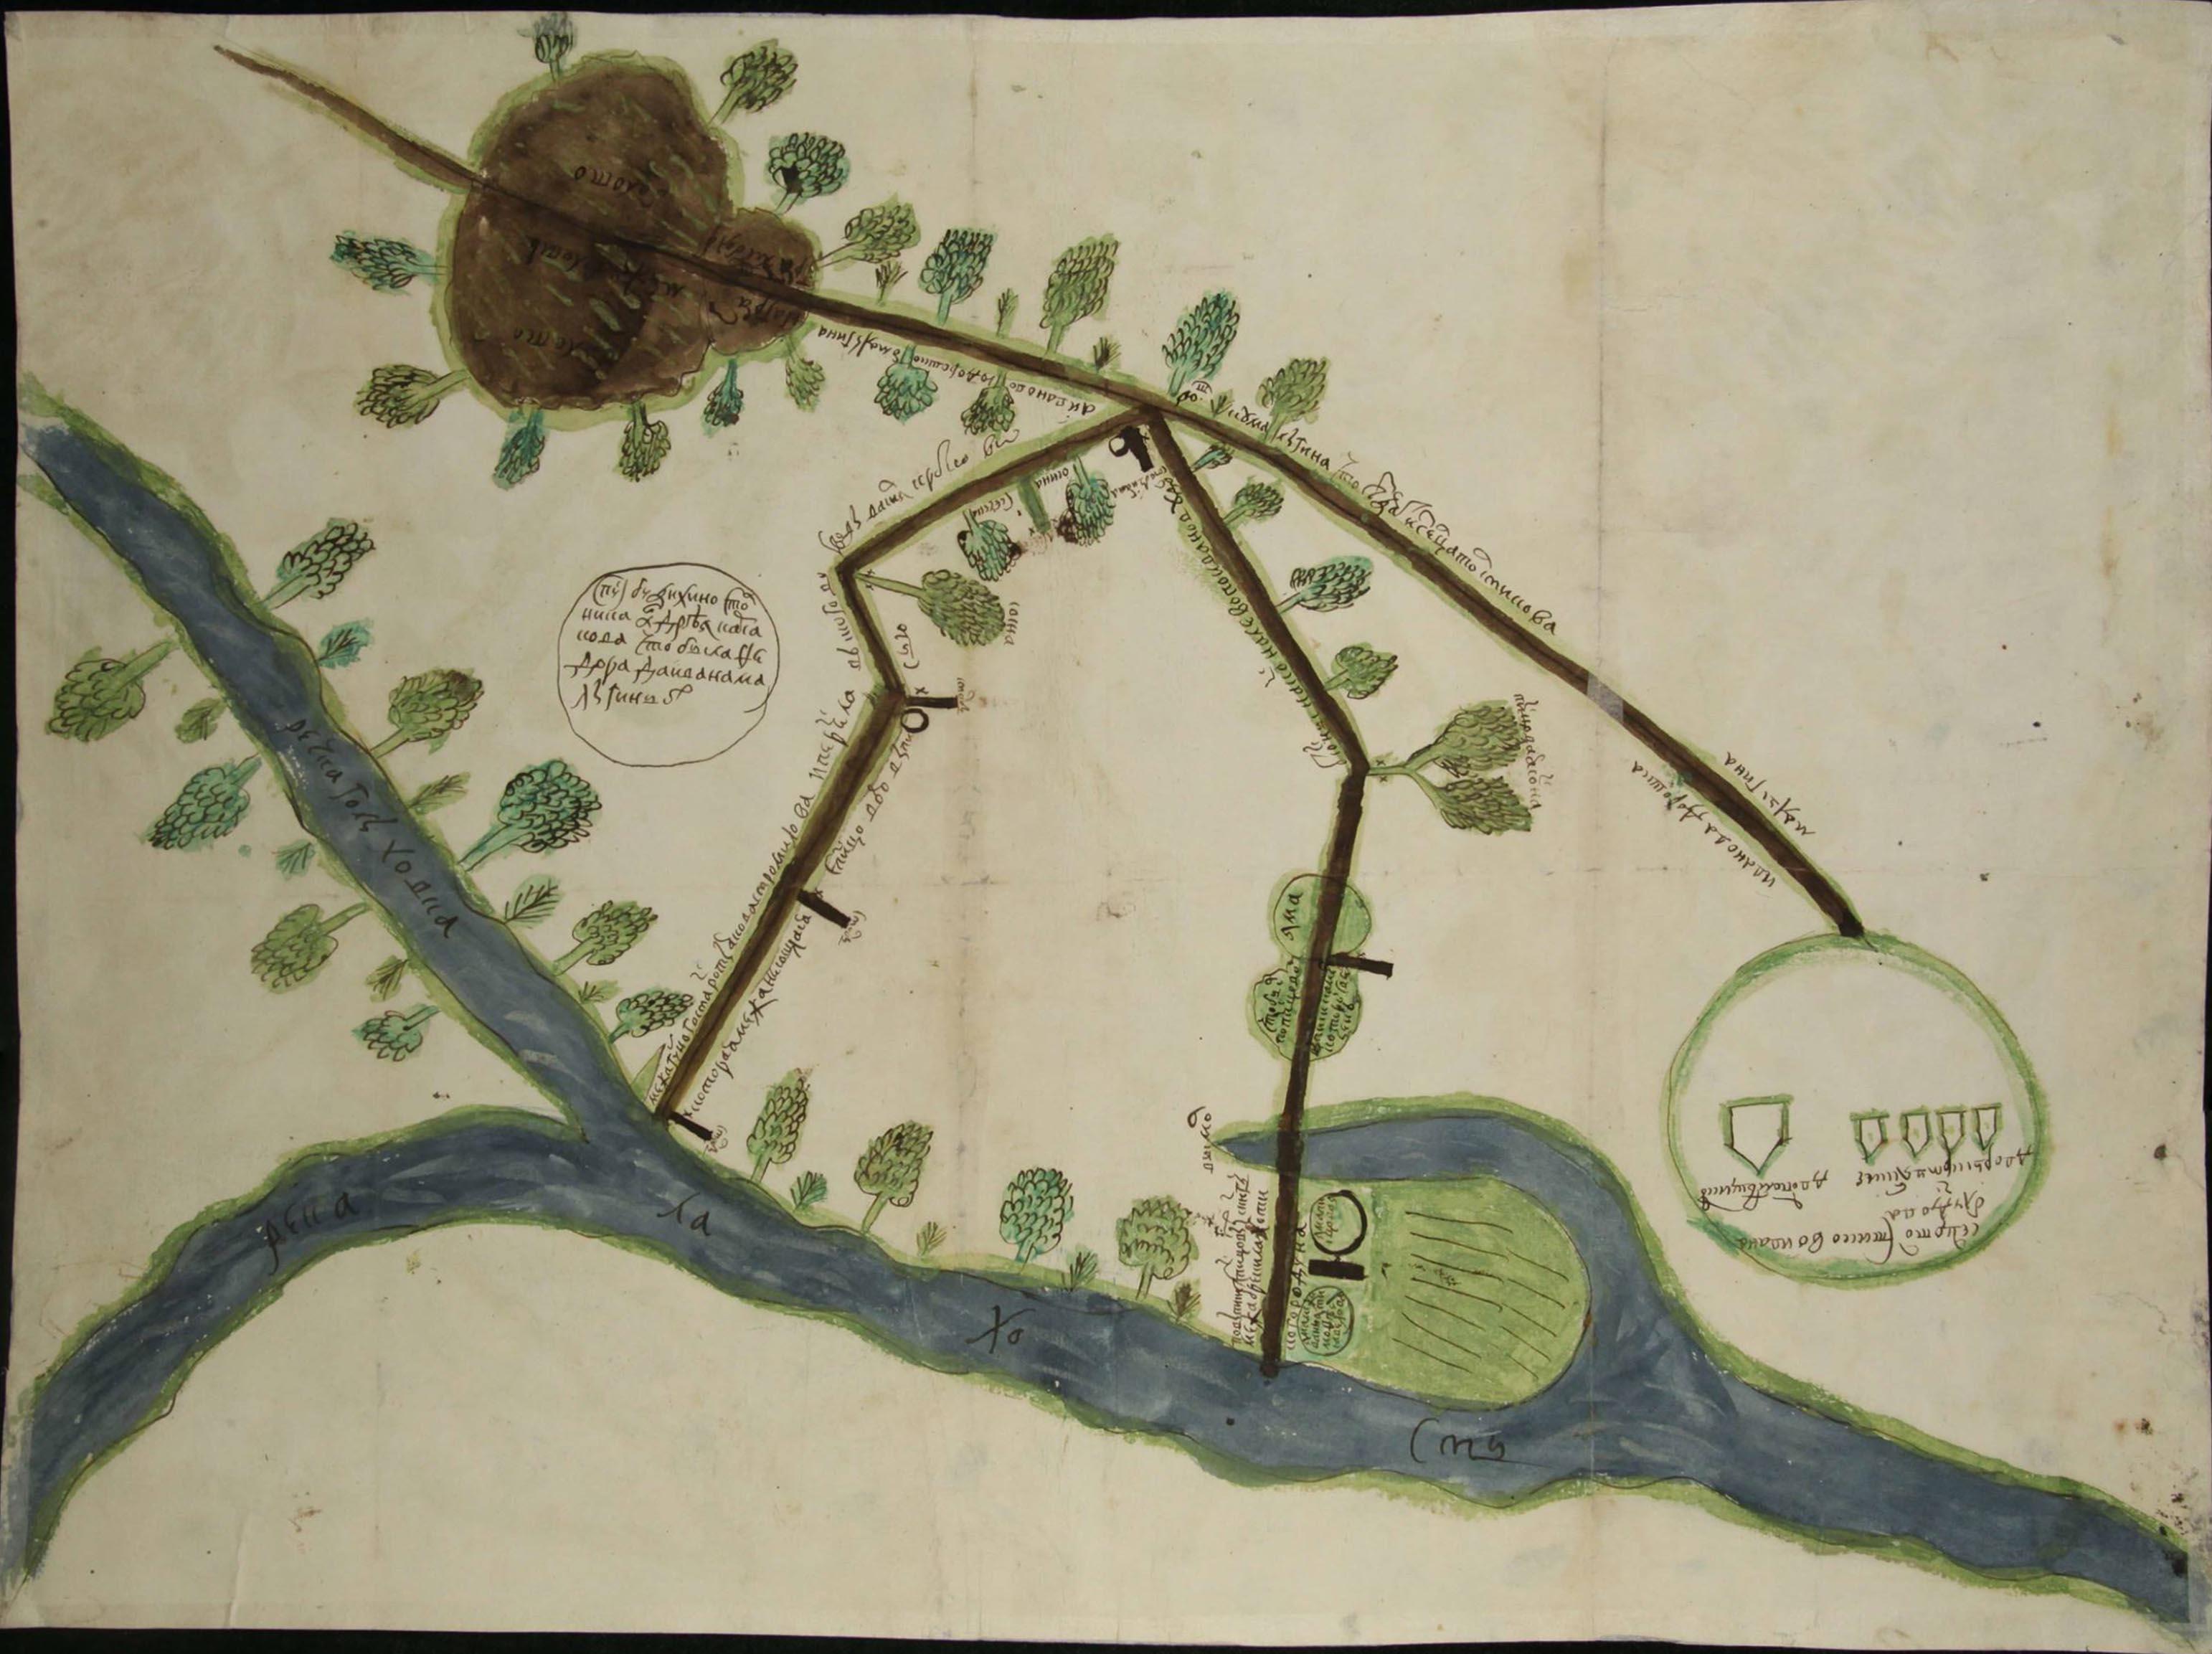 Чертеж земель по реке Лахостъ у сельца Толстикова